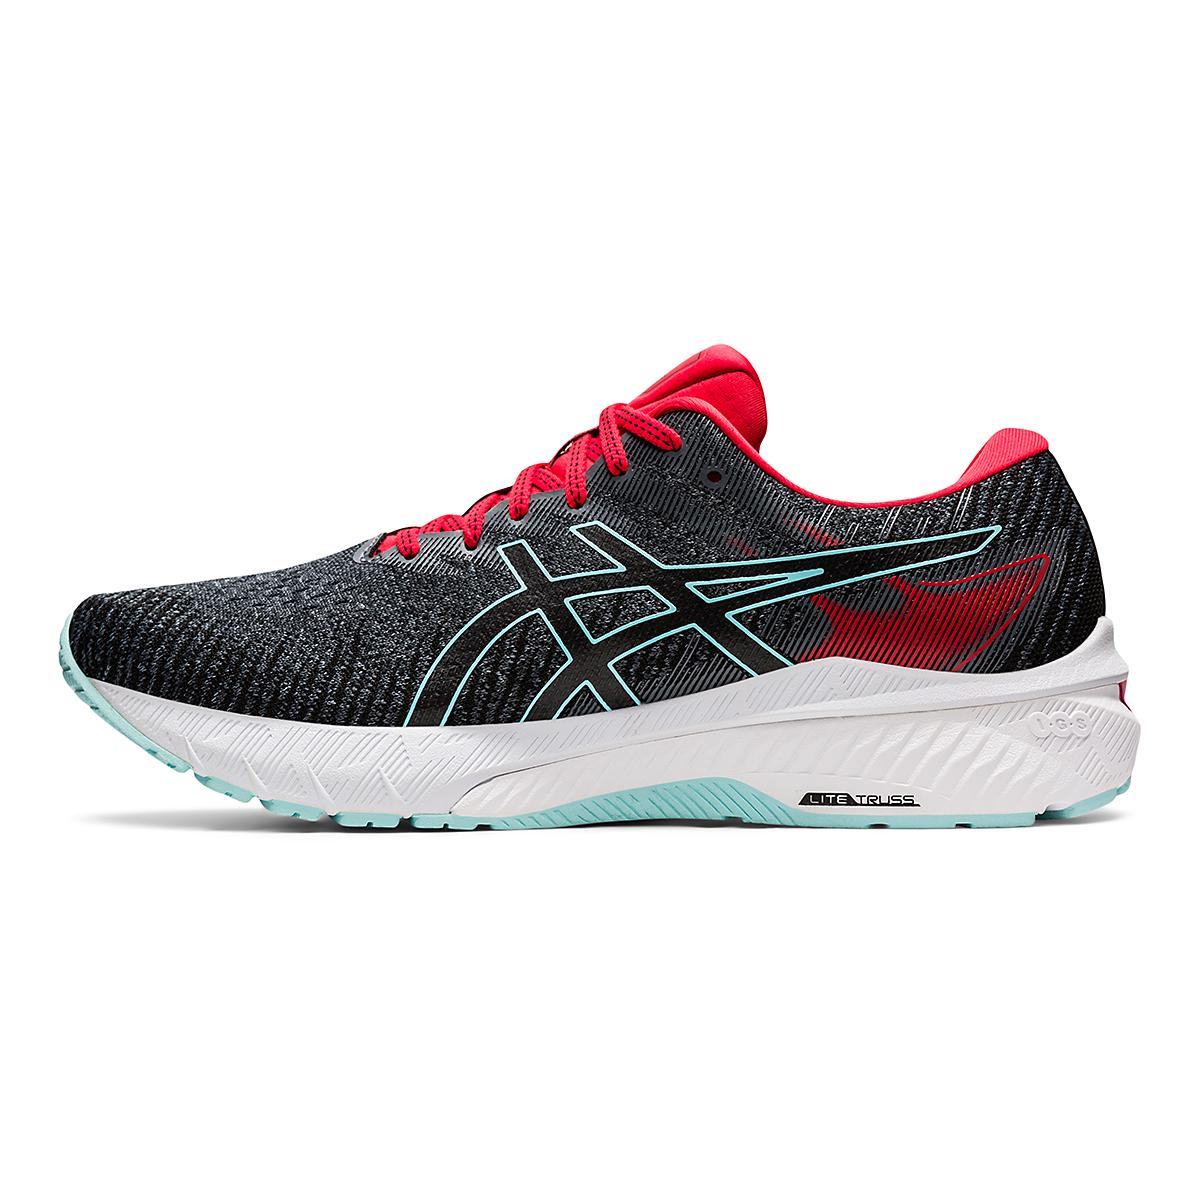 Men's Asics GT-2000 10 Running Shoe - Color: Metropolis/Electric Red - Size: 7 - Width: Regular, Metropolis/Electric Red, large, image 2